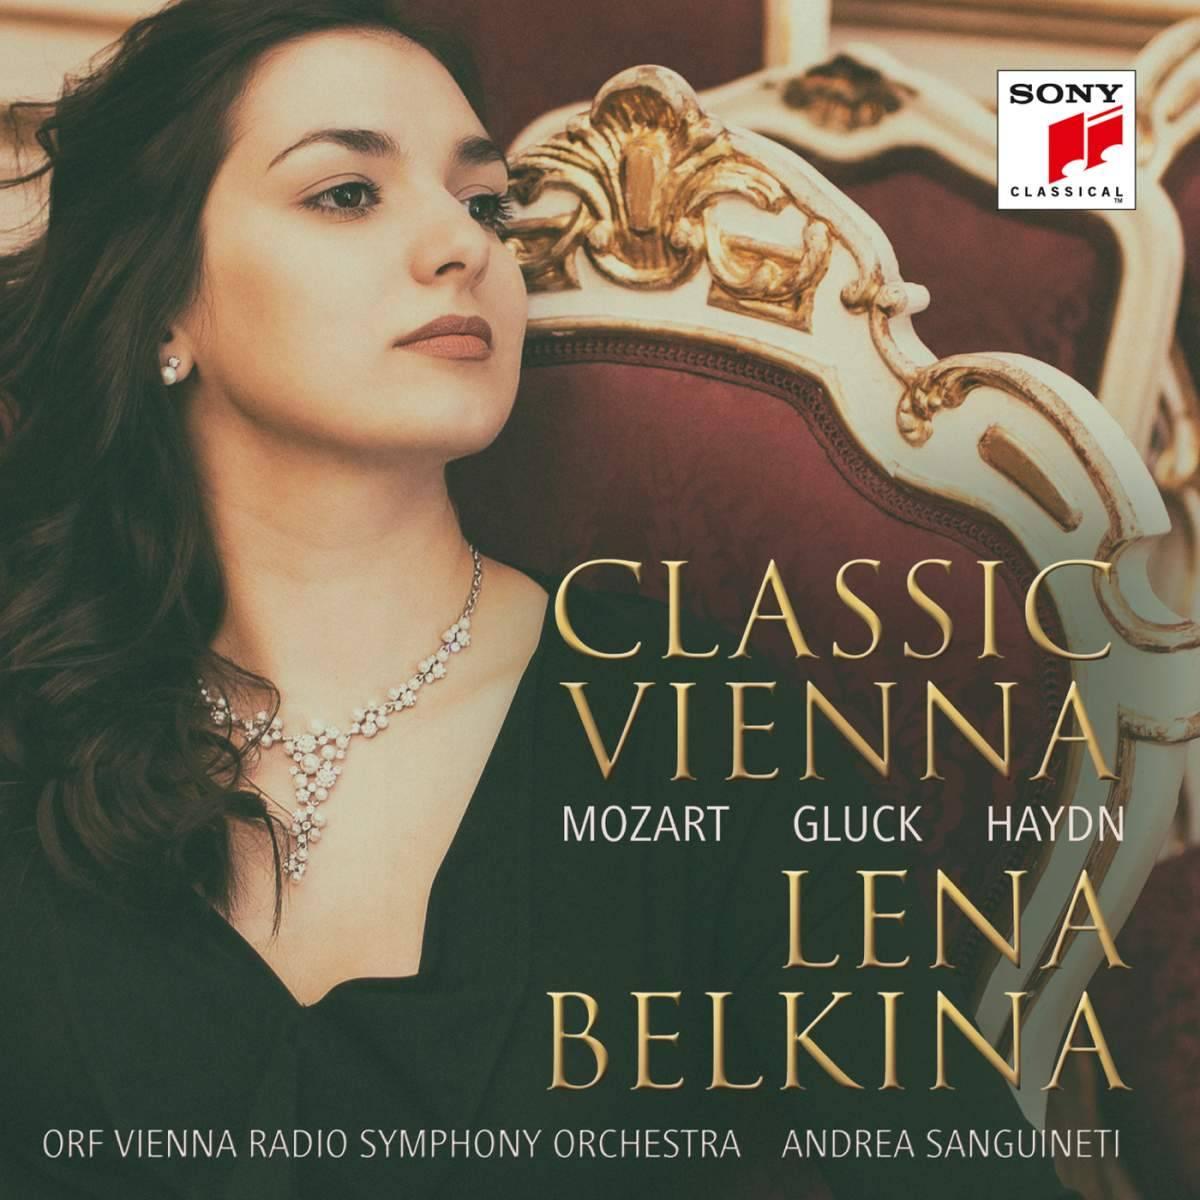 Lena Belkina - Classic Vienna: Mozart - Gluck - Haydn (2017